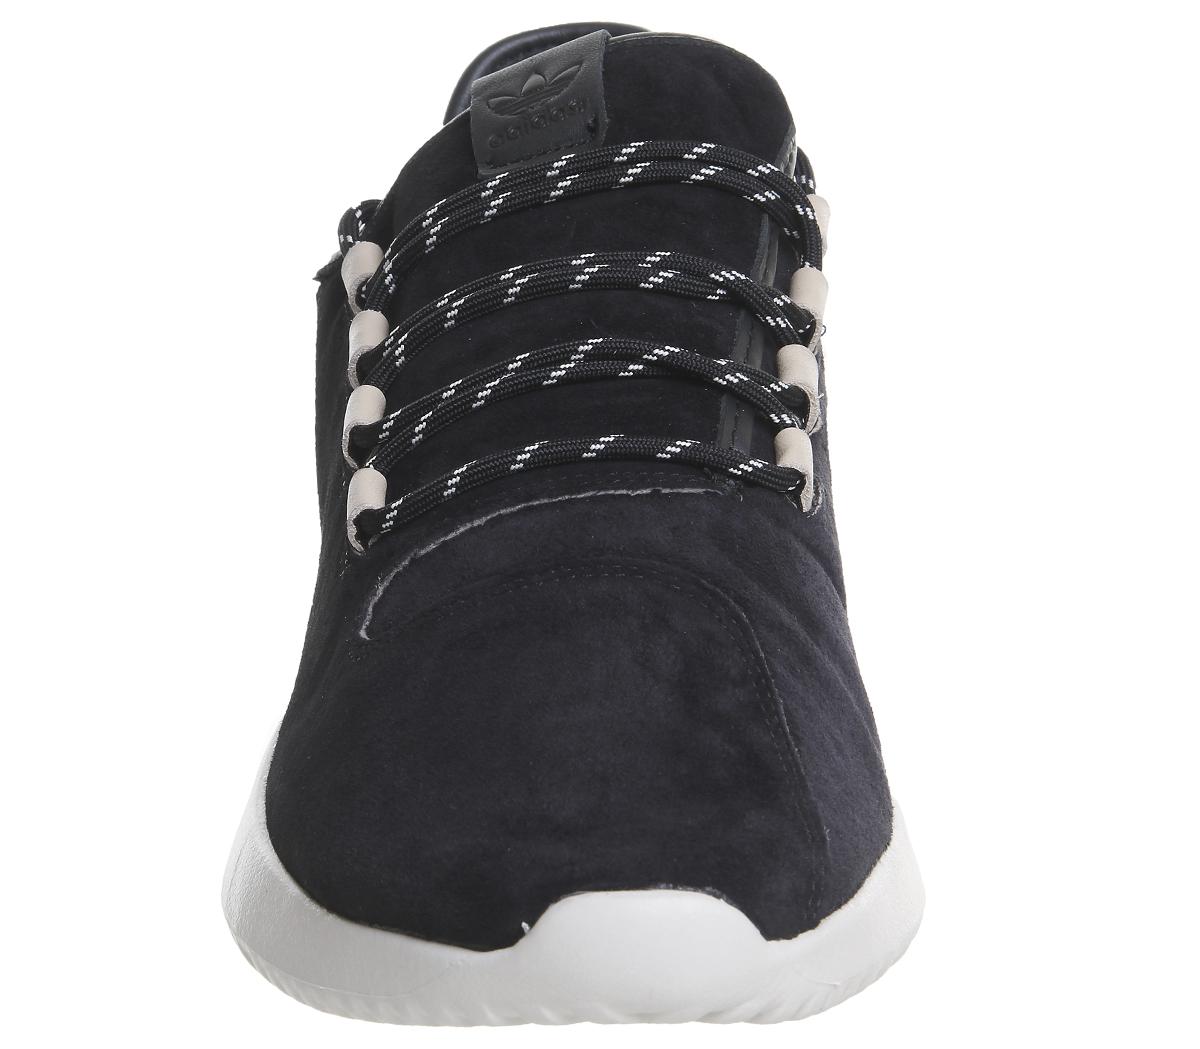 Adidas-Nero-Ombra-Tubular-Off-Scarpe-Da-Ginnastica-Bianco